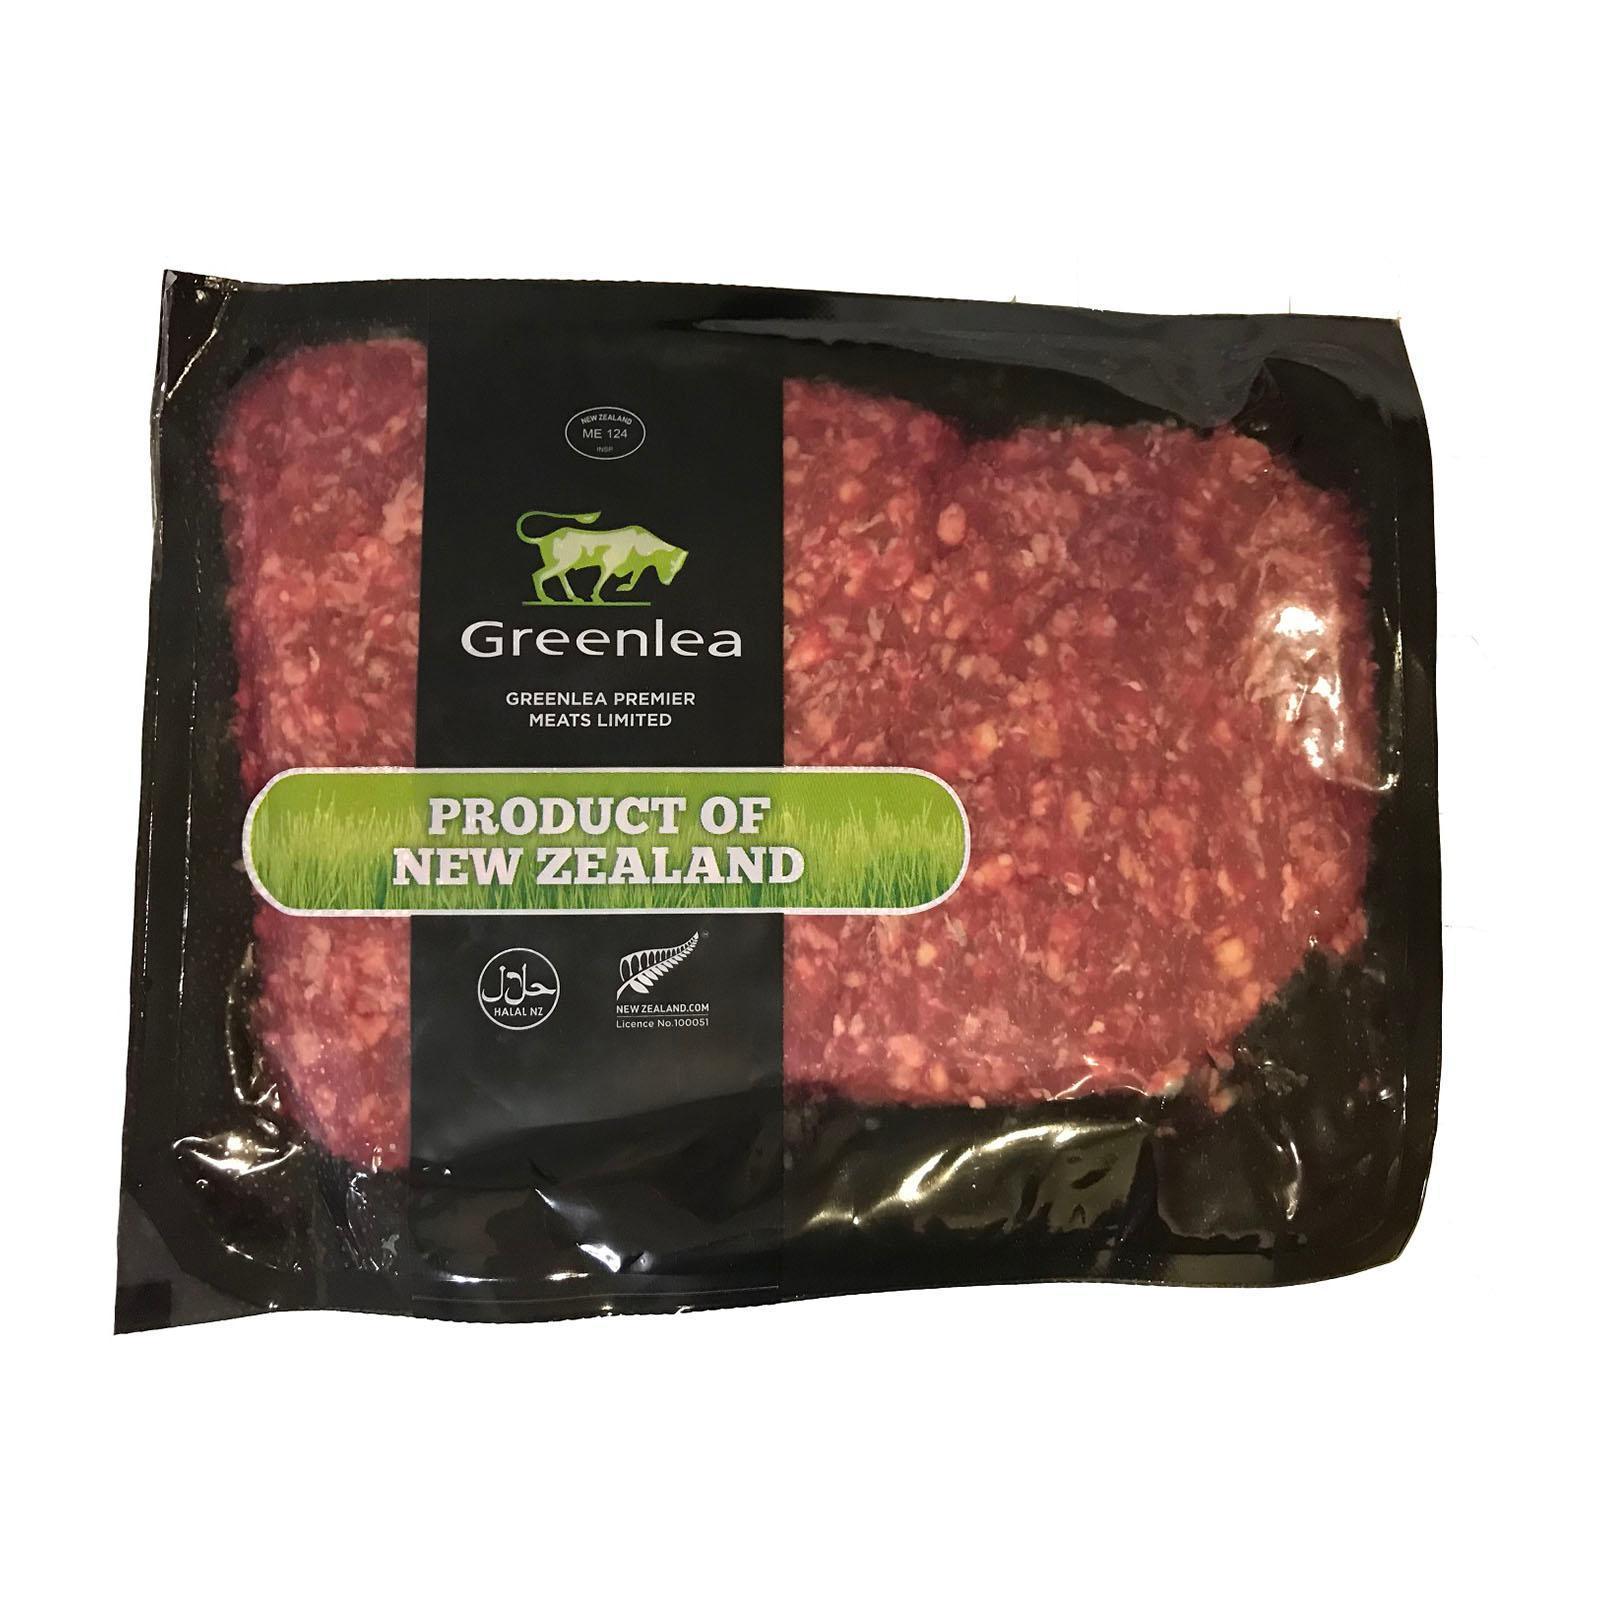 Greenlea Grass Fed Beef Mince - New Zealand